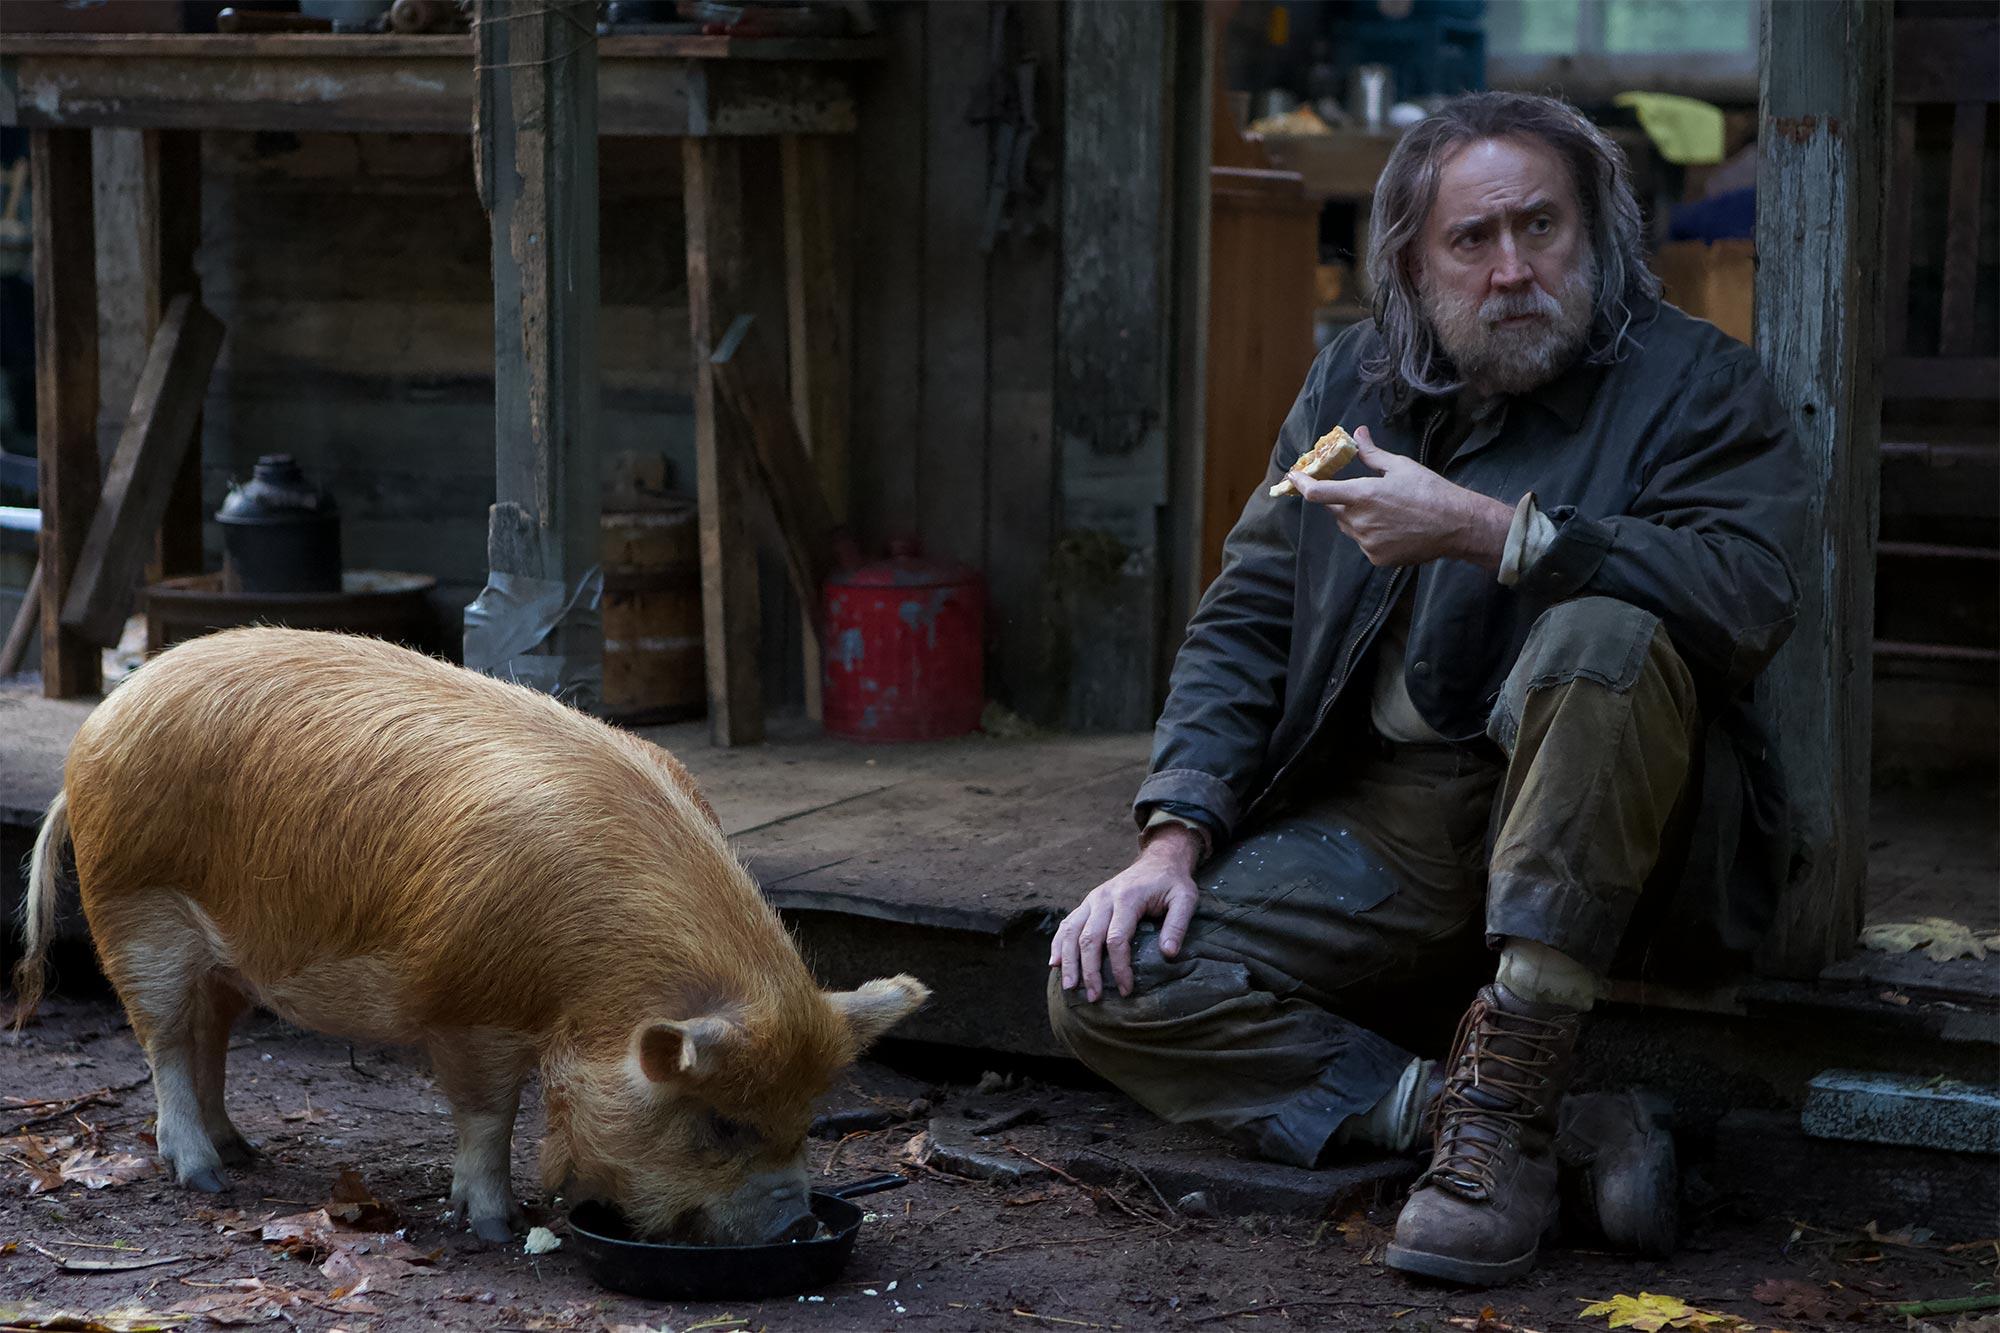 Nicolas Cage's new movie Pig lands actor's best Rotten Tomatoes score |  EW.com